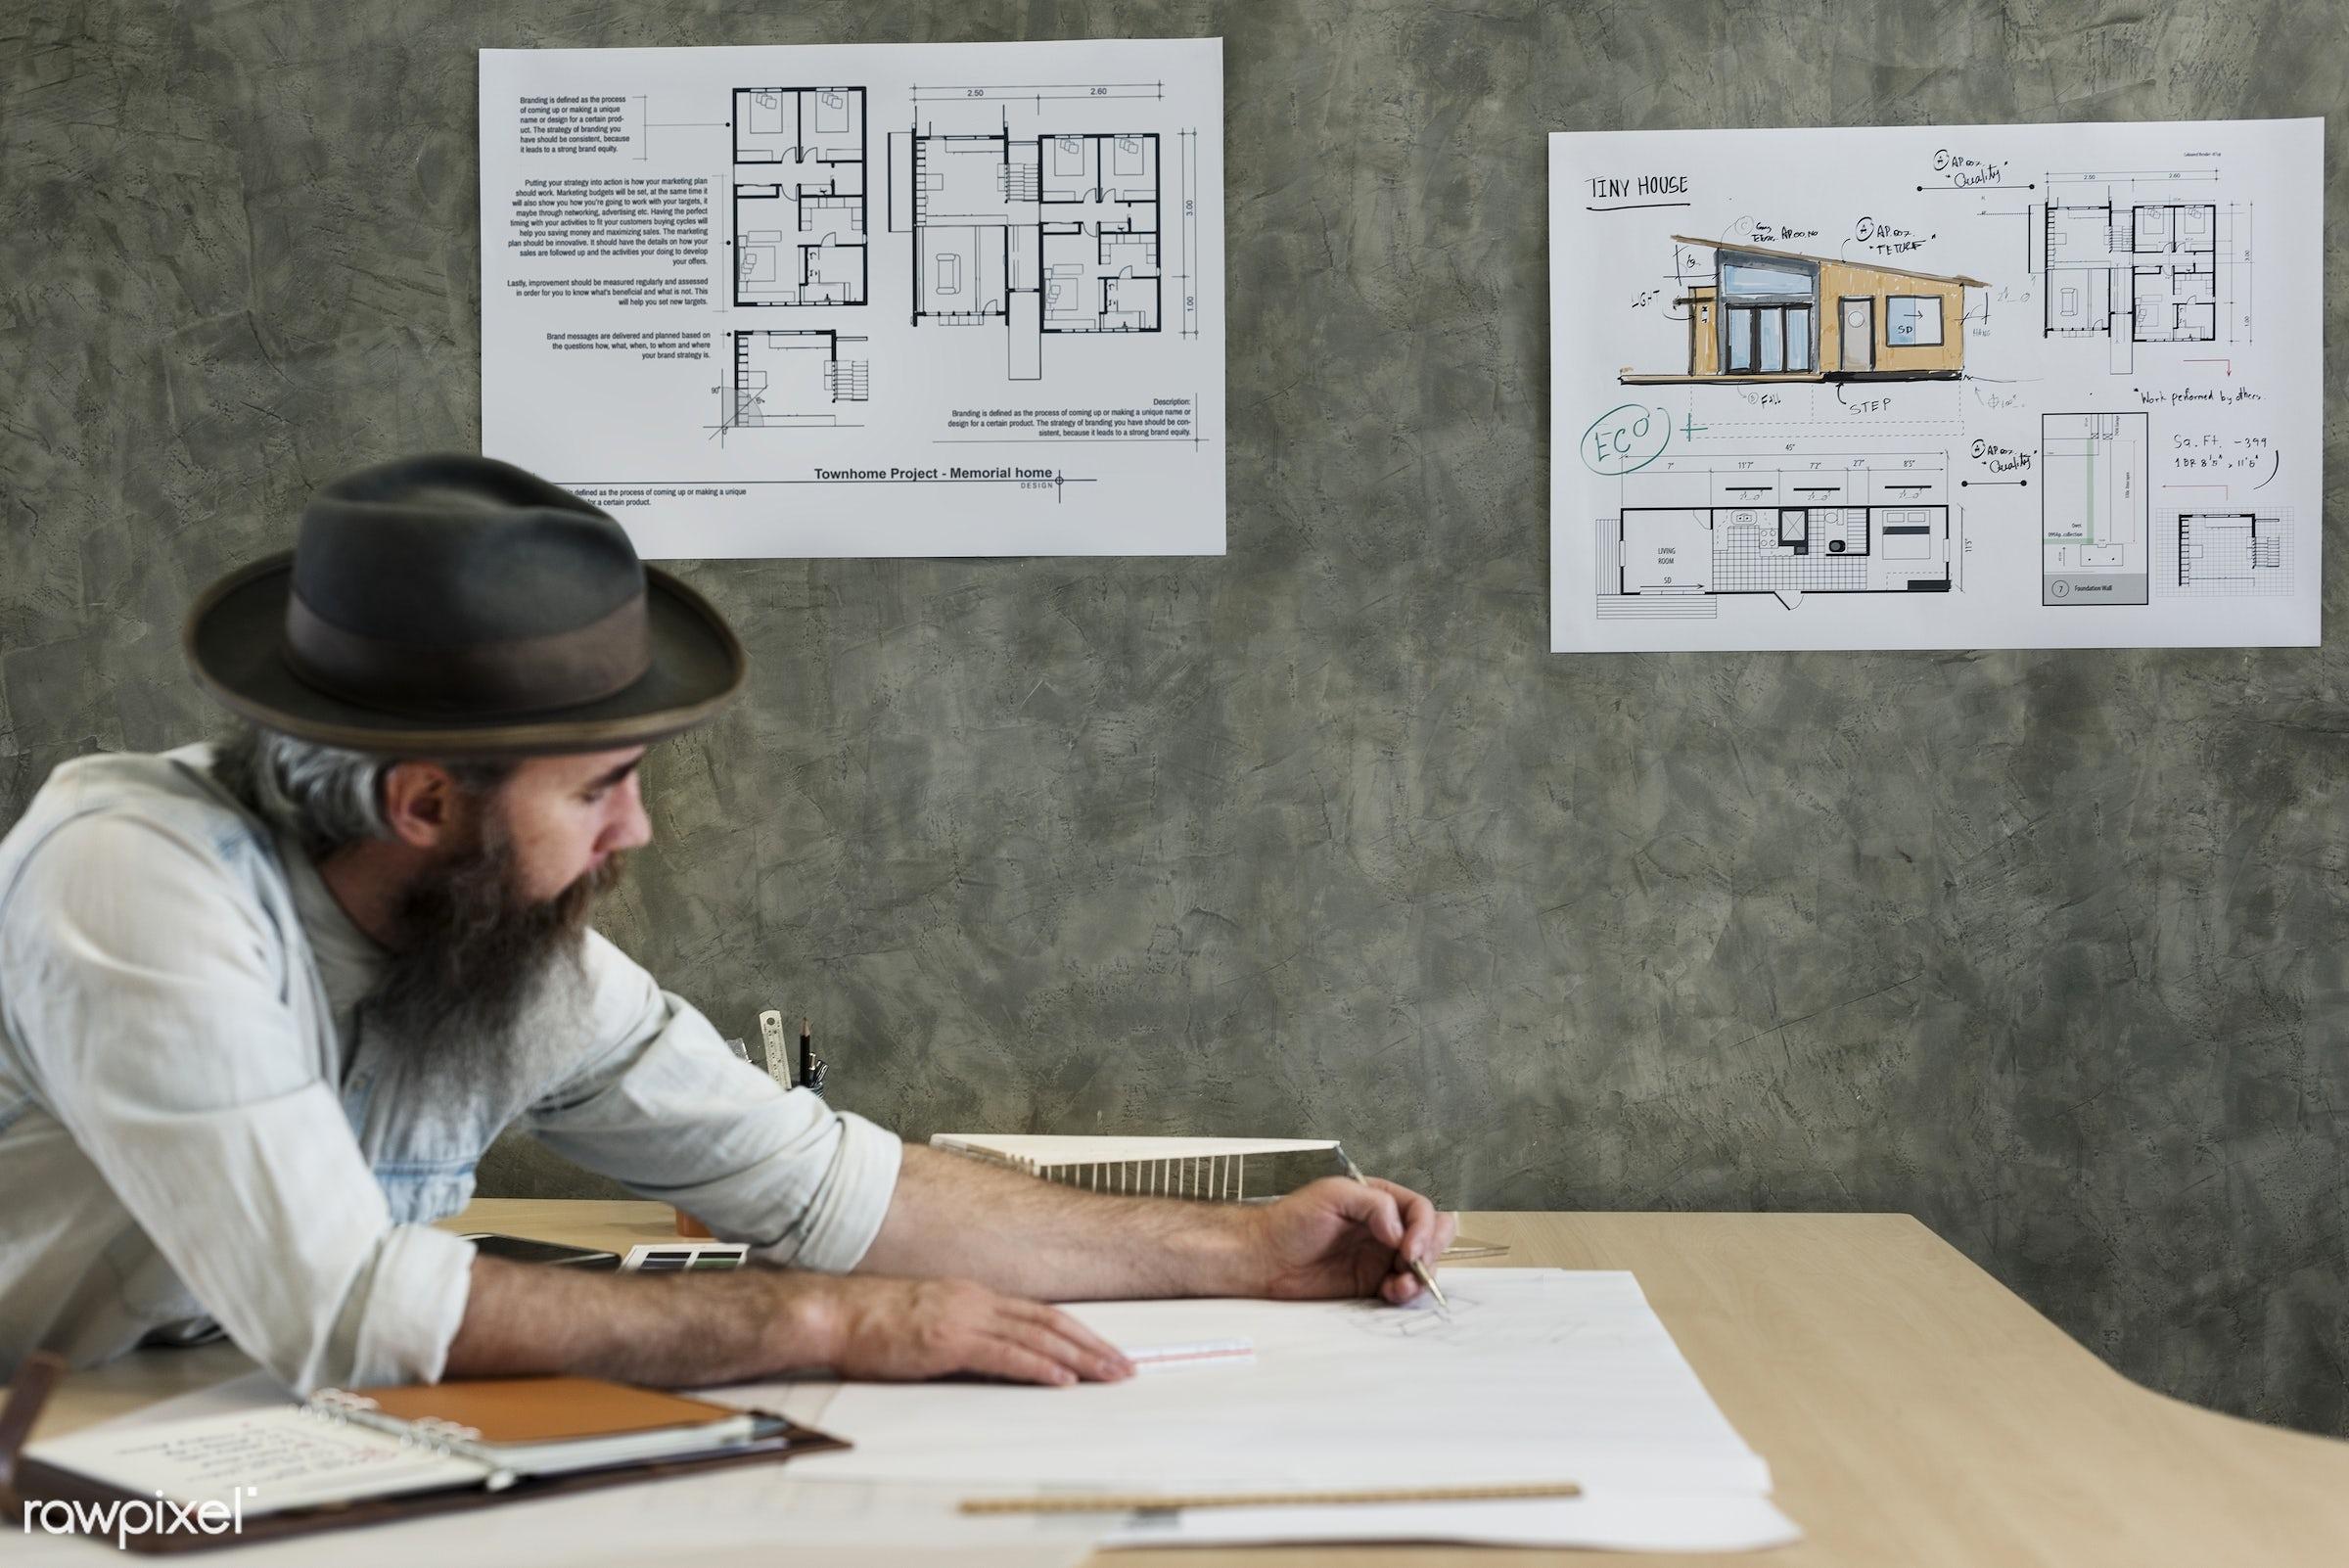 Architect working in a design studio - designer, model, structure, architect, architecture, blueprint, brainstorming, color...